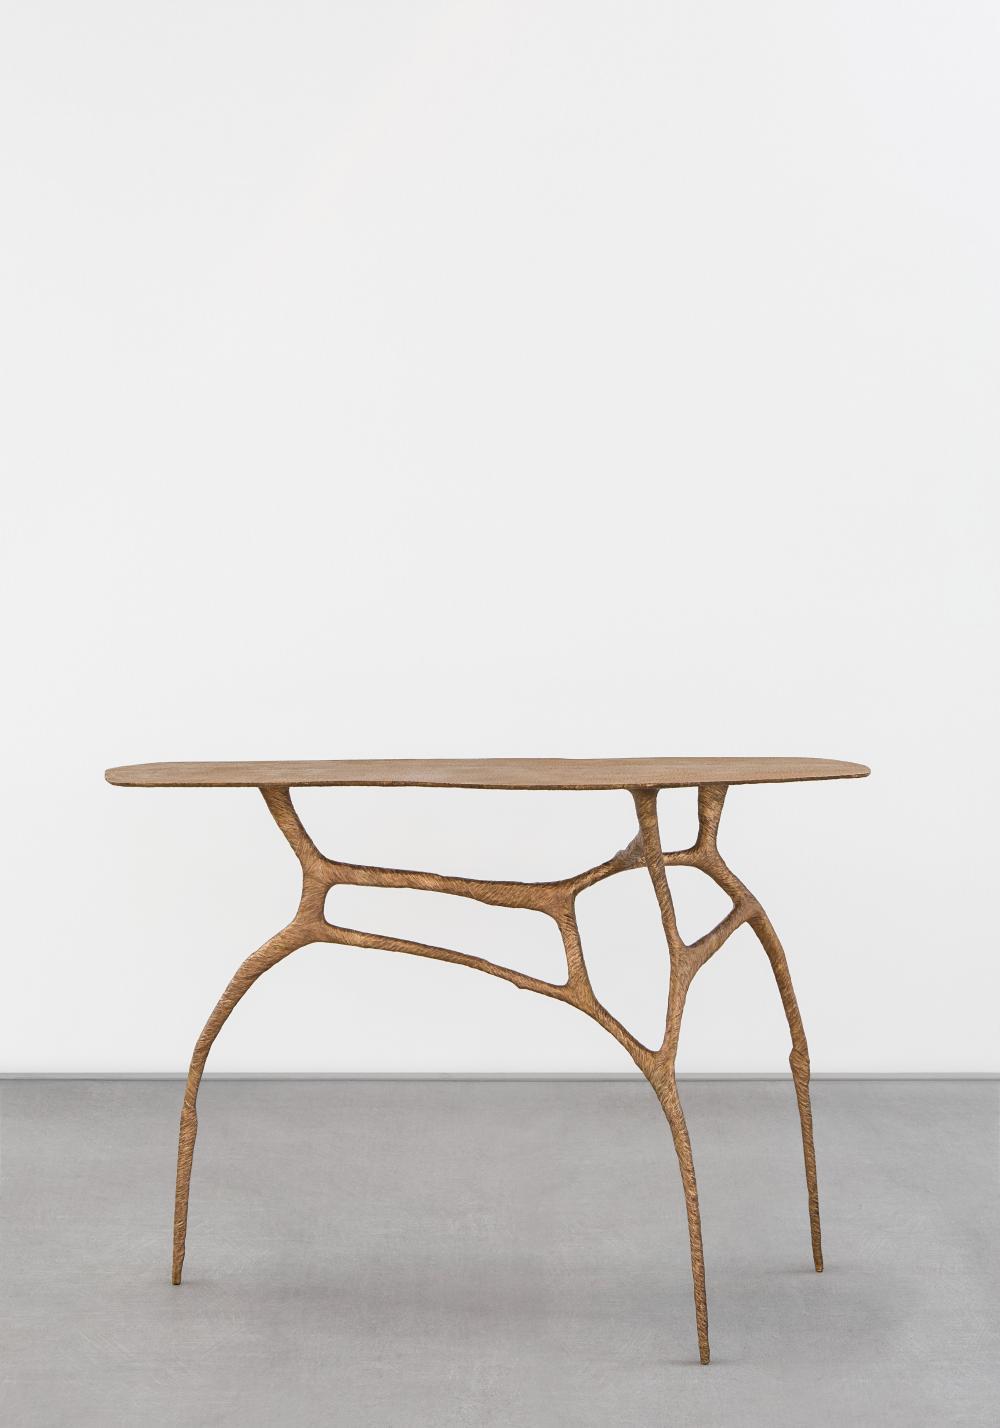 Art furniture The best Art furniture by Charles Trevelyan The best Art furniture by Charles Trevelyan I Lobo you12